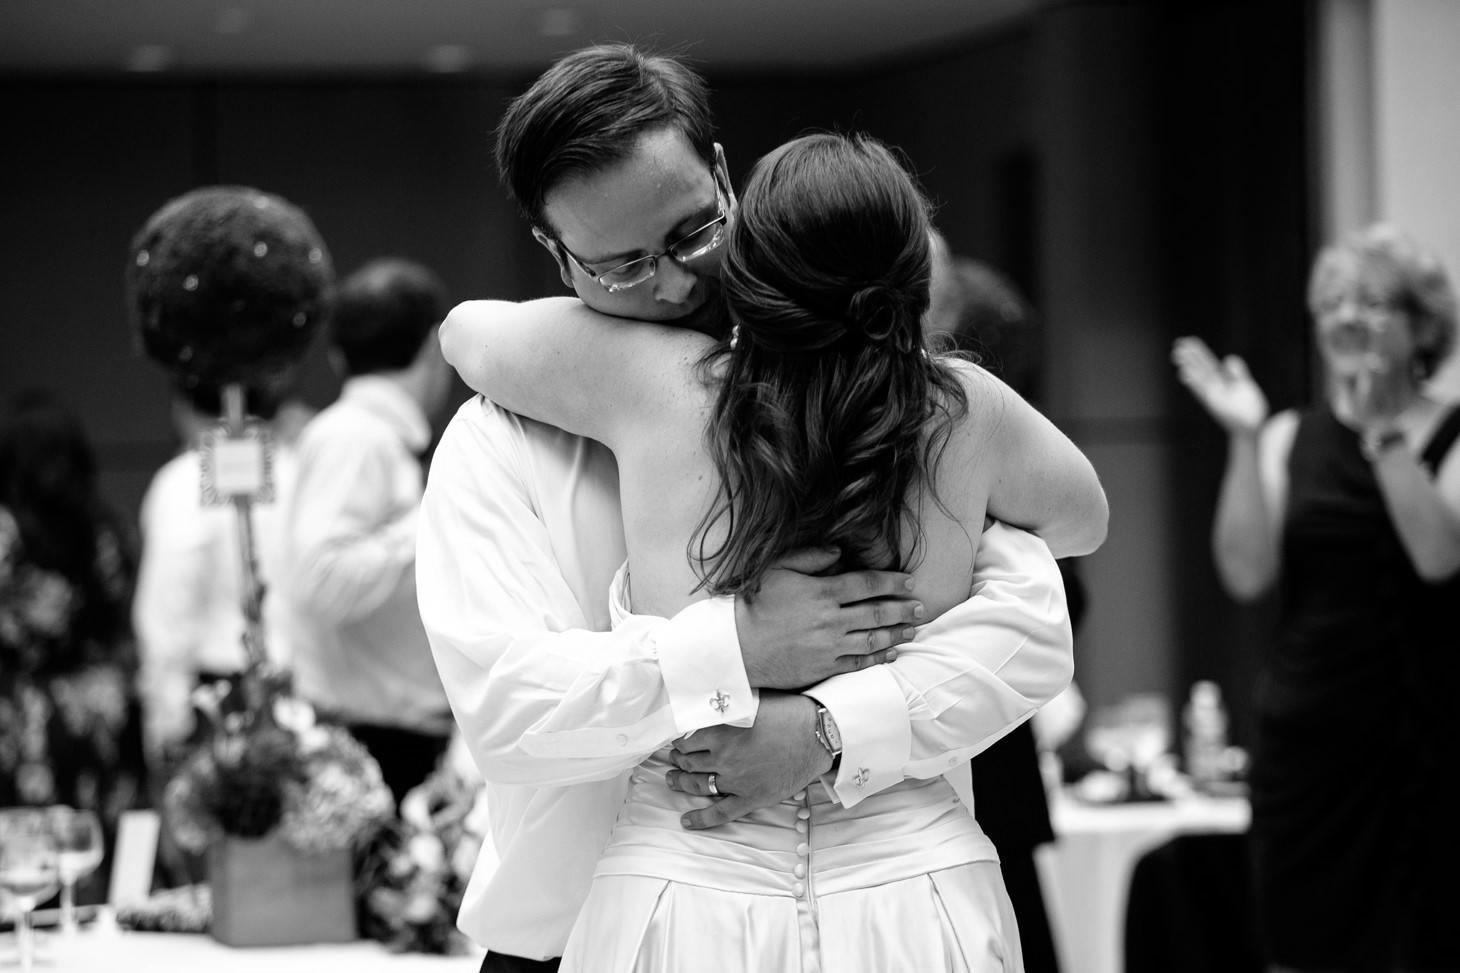 103-nyc-wedding-photographer-hoboken-waterfront-wedding-photos-smitten-chickens.jpg